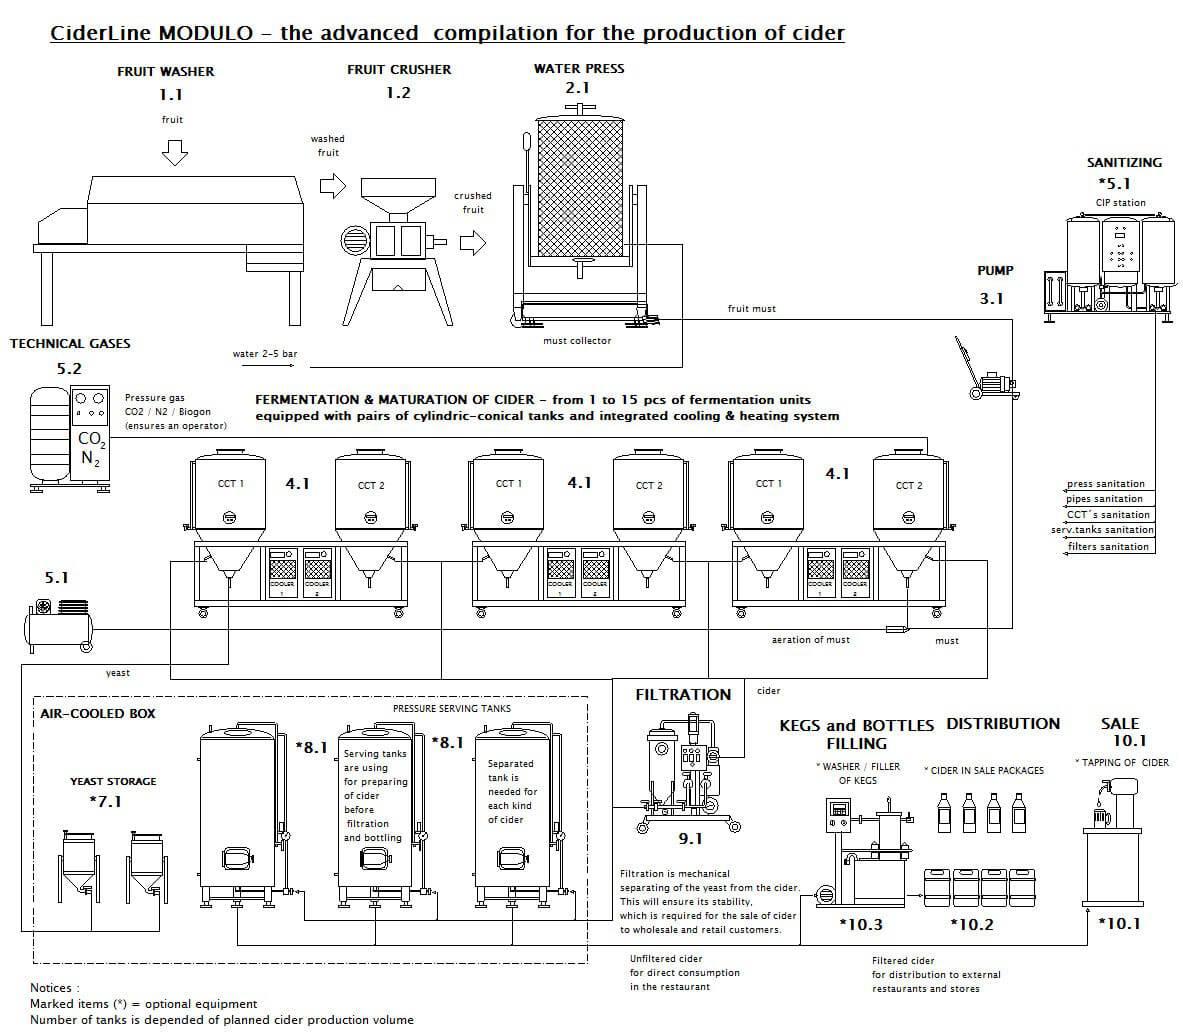 CIDER LINE MODULO 2000M-360E - The modular cider production line - scheme